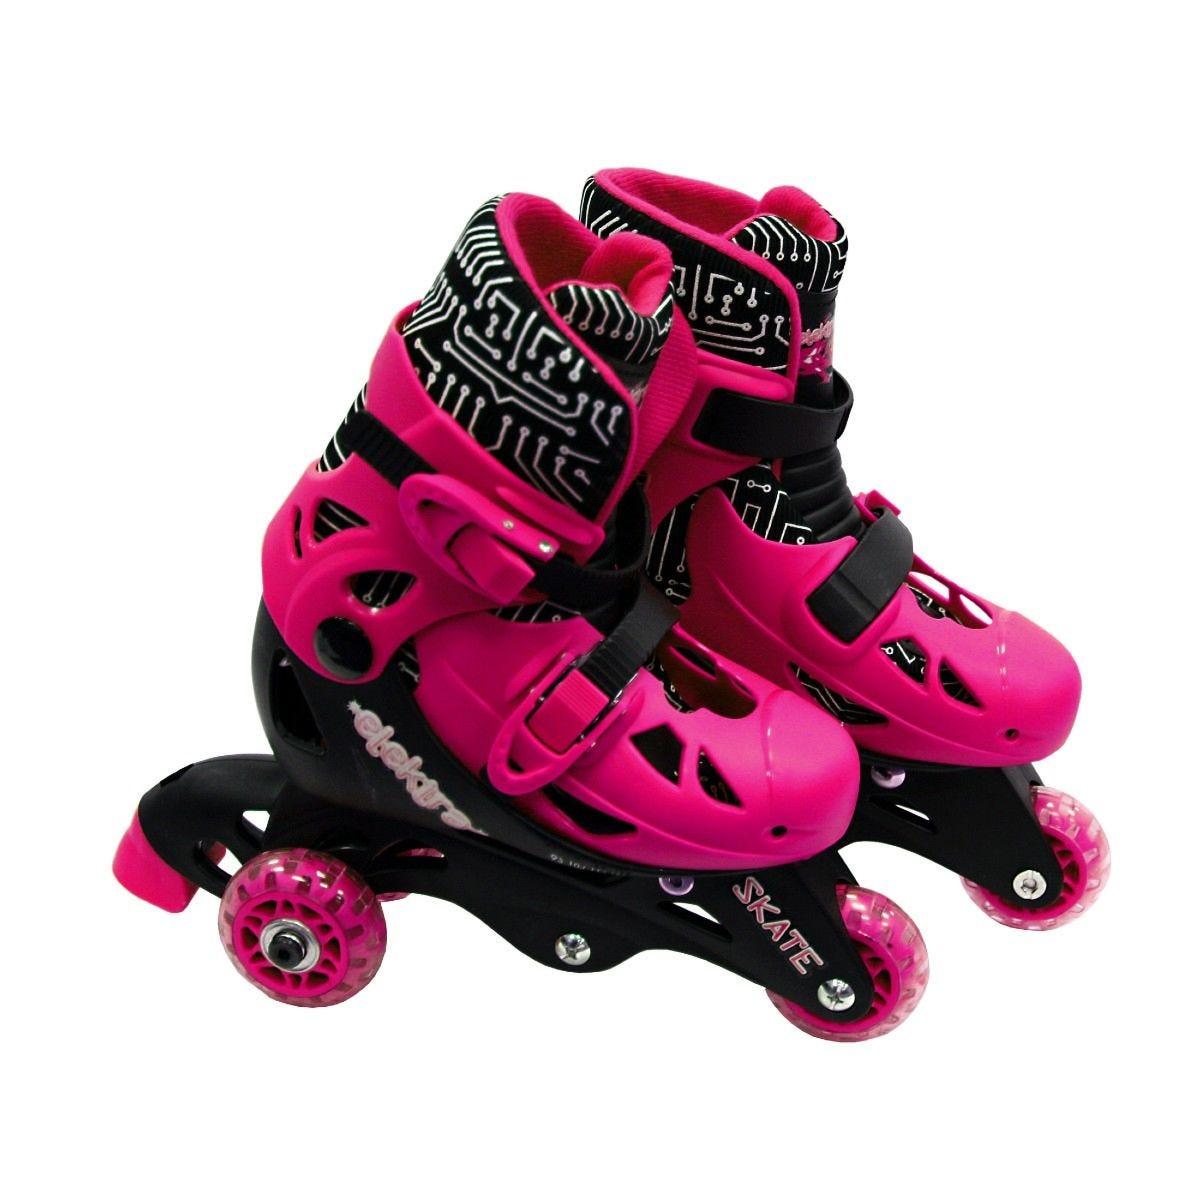 Elektra Tri Line Adjustable Small Skate Boots Pink